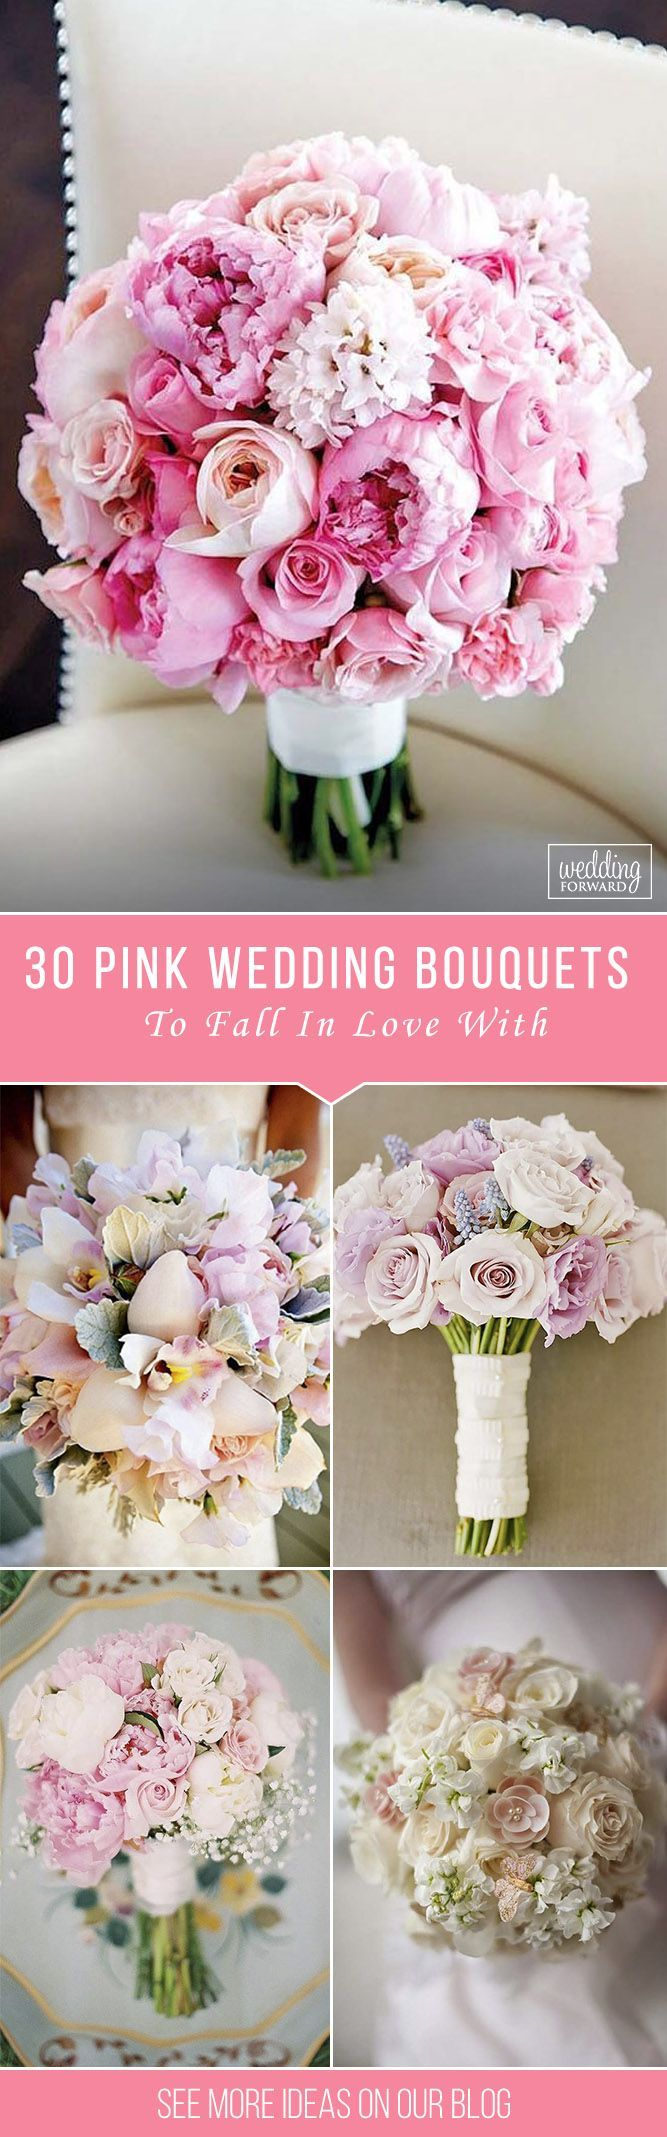 204 best WEDDING IDEAS images on Pinterest | Ideas para boda ...